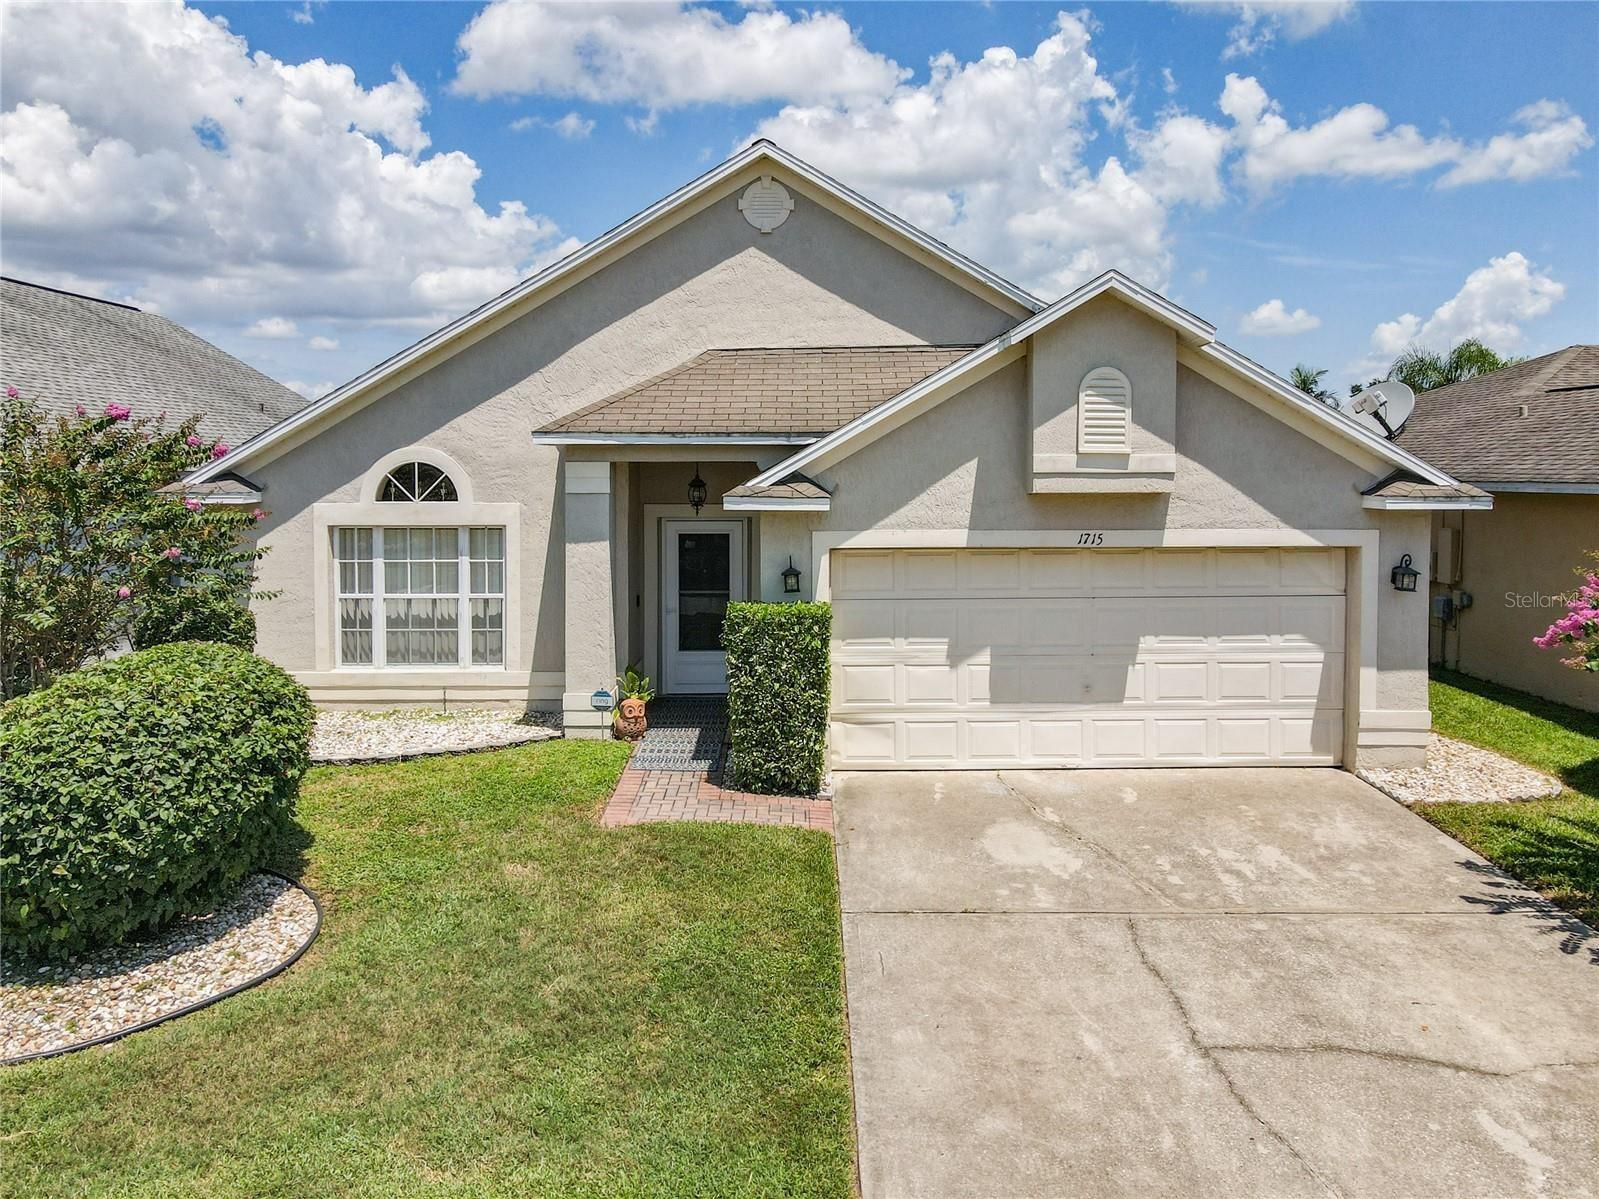 1715 ACKER STREET, Orlando, FL 32837 - #: S5055440